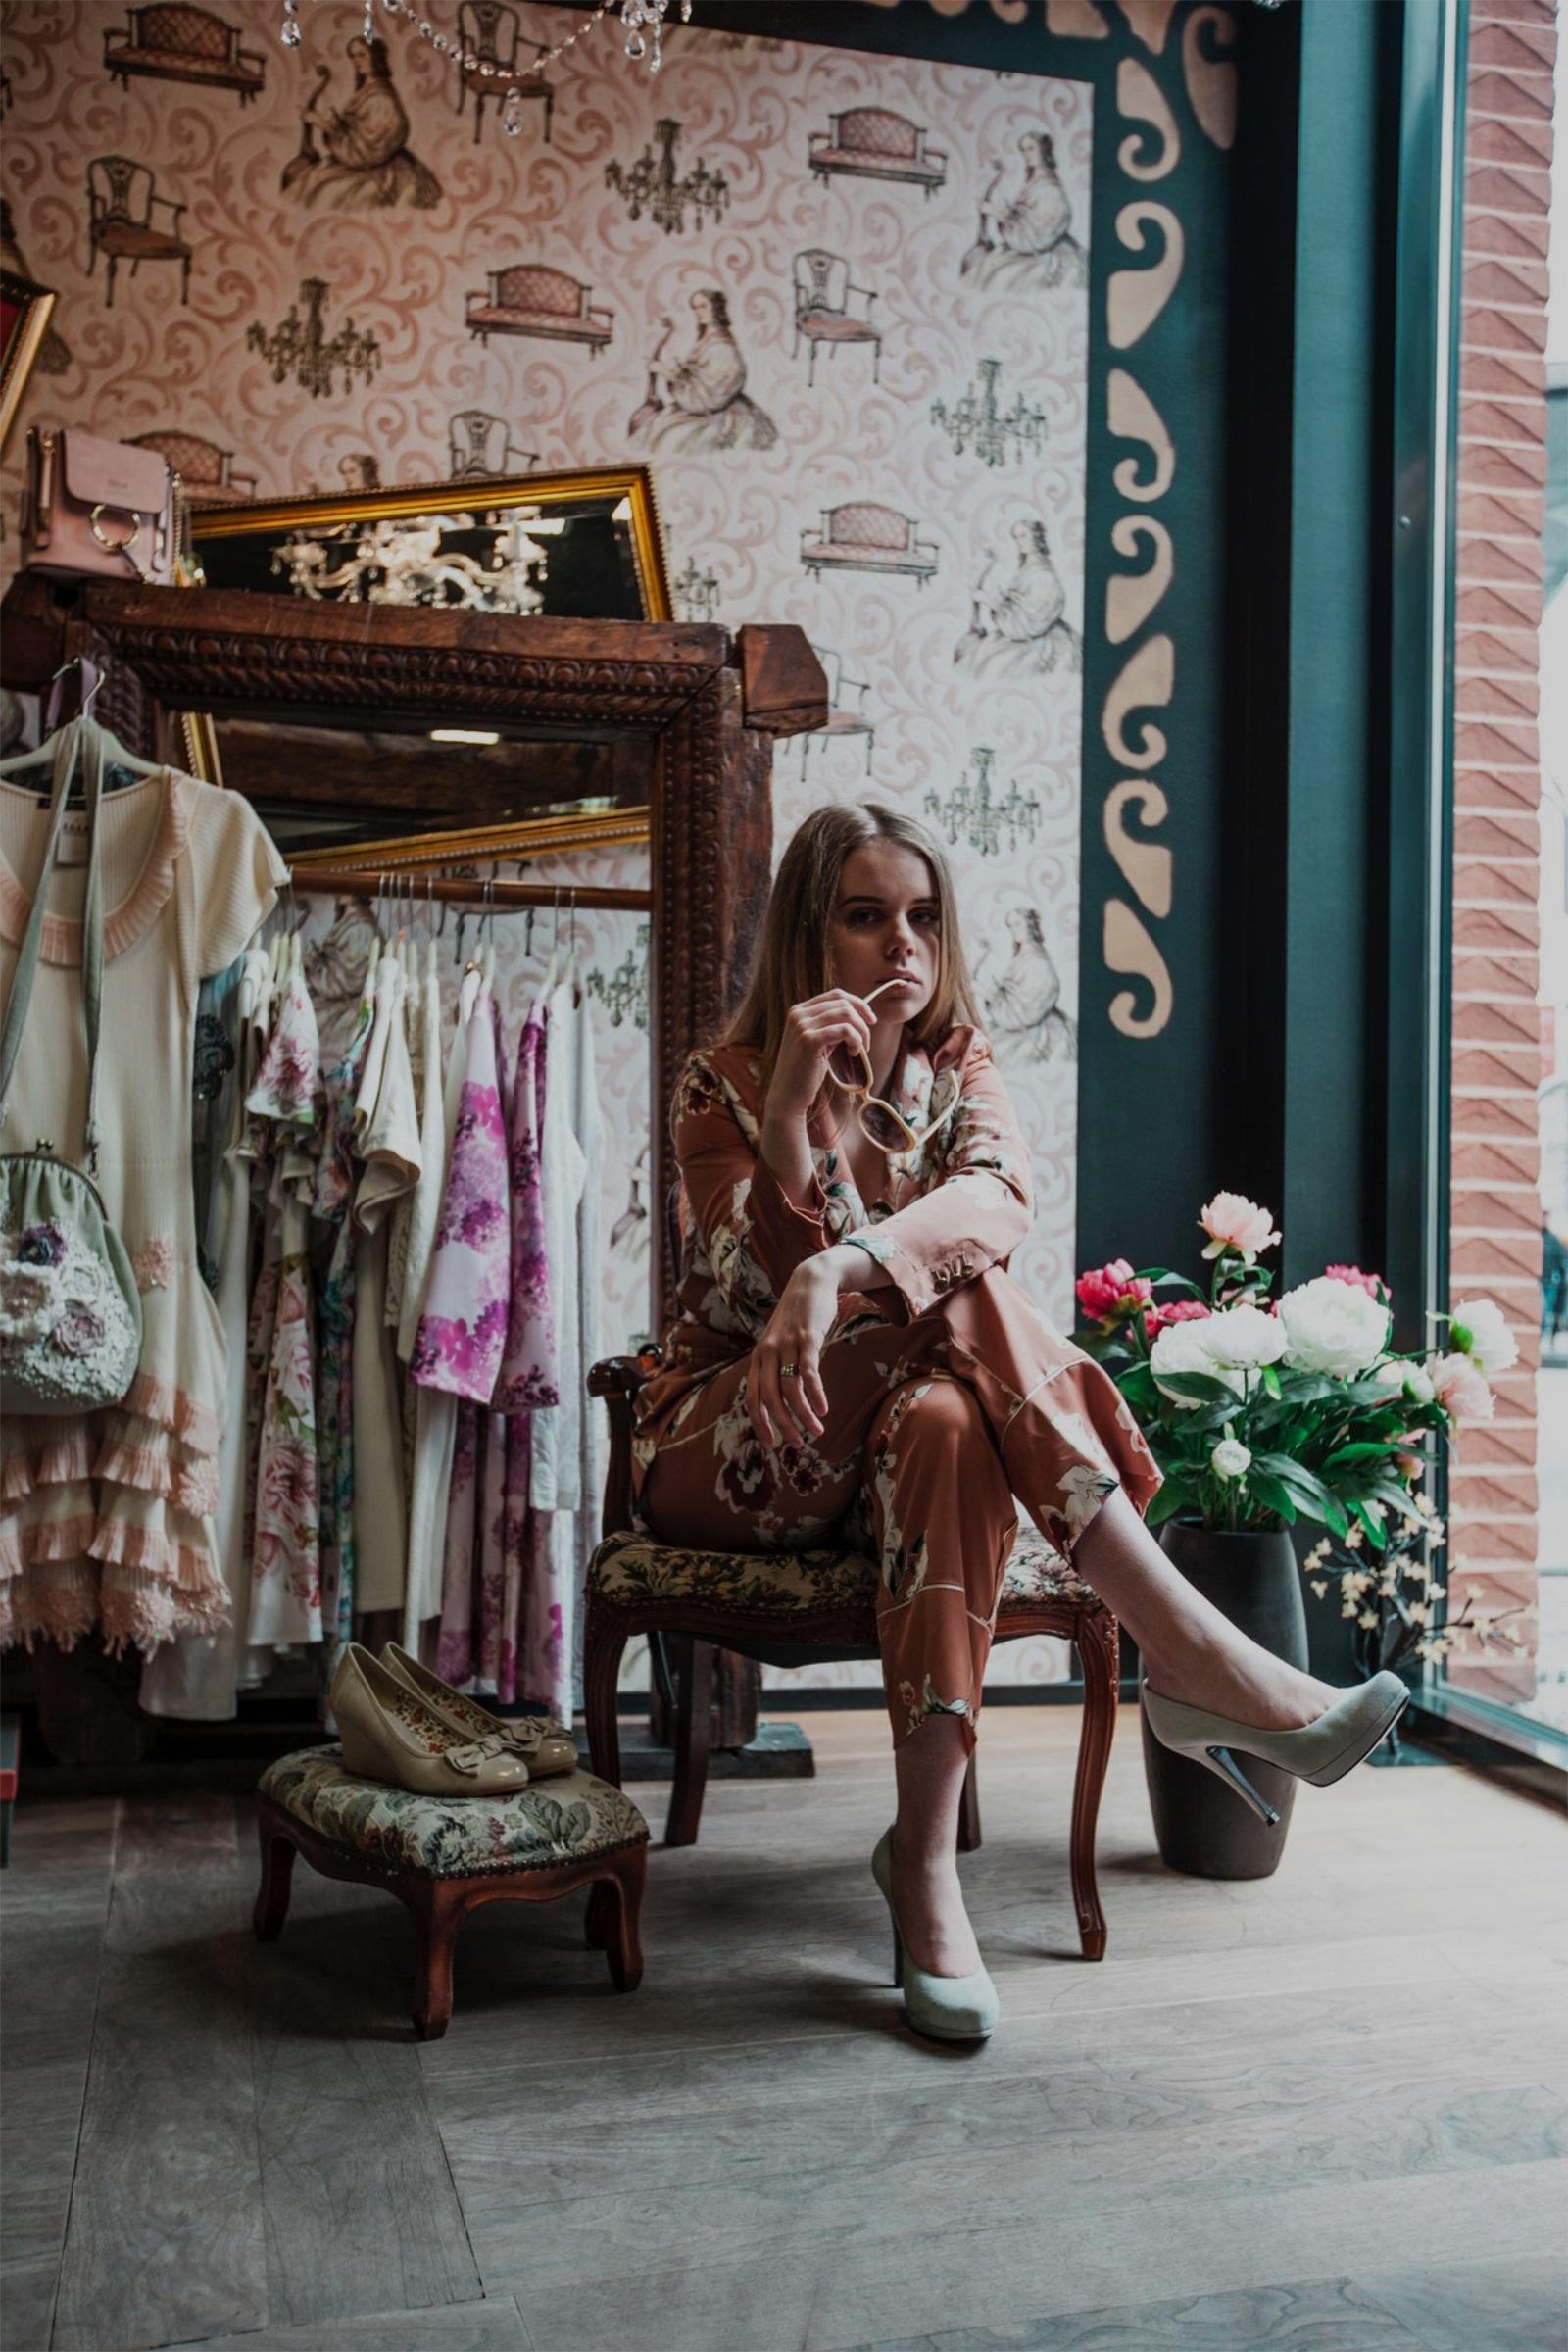 Men's/Women's Quality Clothing Manufacturers & Jersey Manufacturers & Garment Manufacturers ~ Private Label Ladies/Women's Wear: Blouses, T shirts, Dresses, Skirts, Sweatshirts, Hoodies, Trousers | Men's Wear - Kid's Wear - Activewear - Accessories | İstanbul - TURKEY